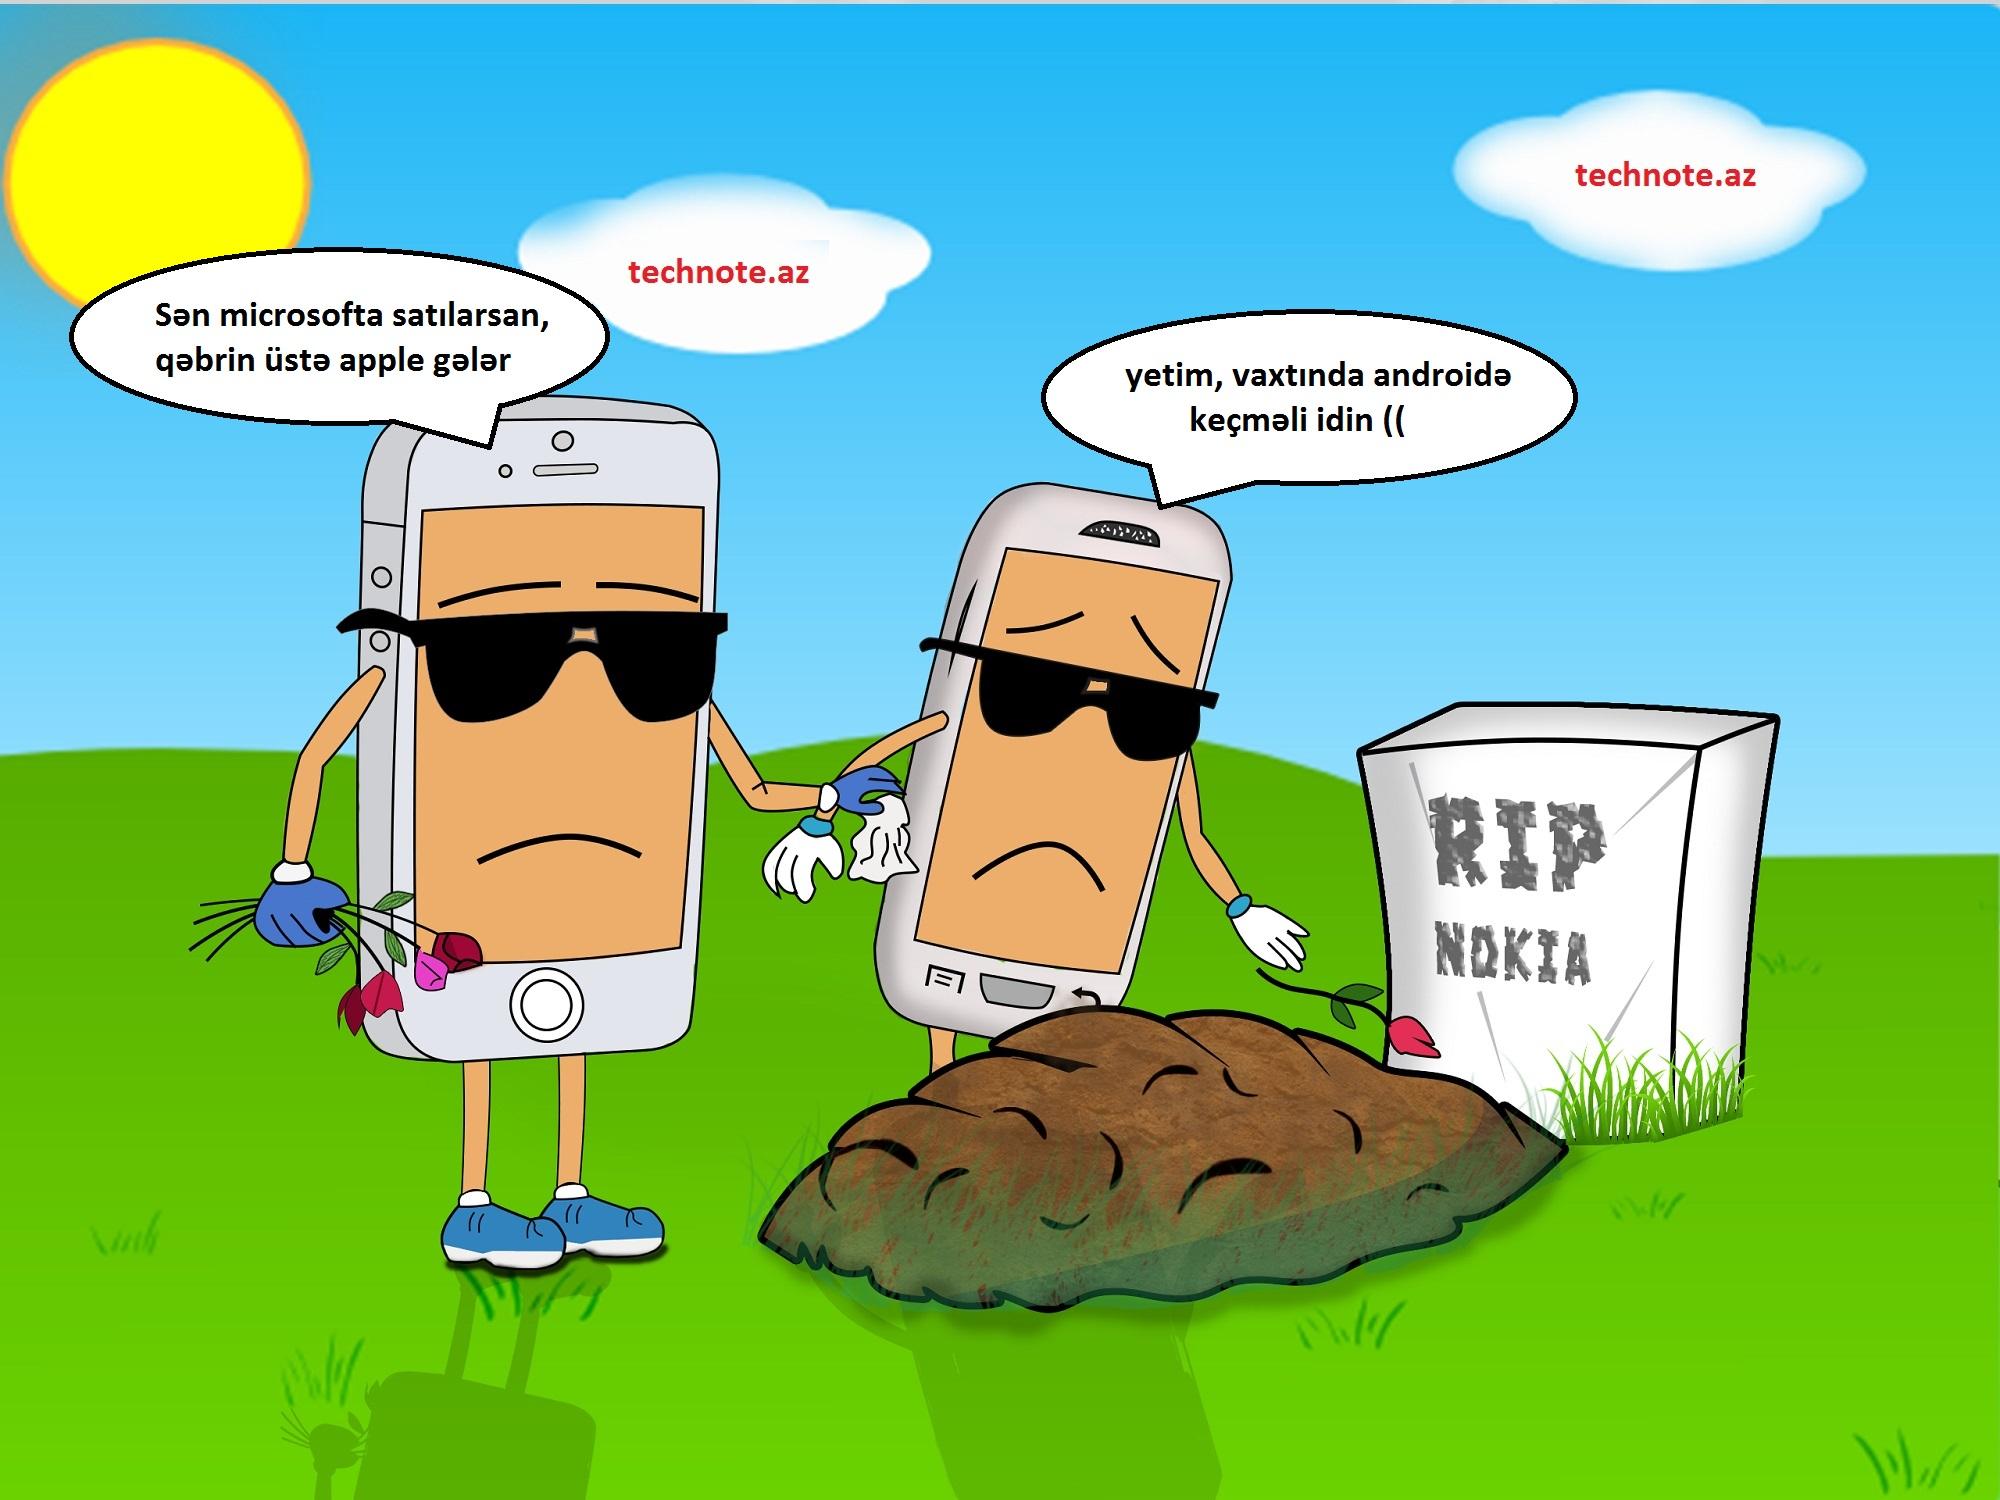 Nokia, Apple, Samsung - dəfn karikaturası